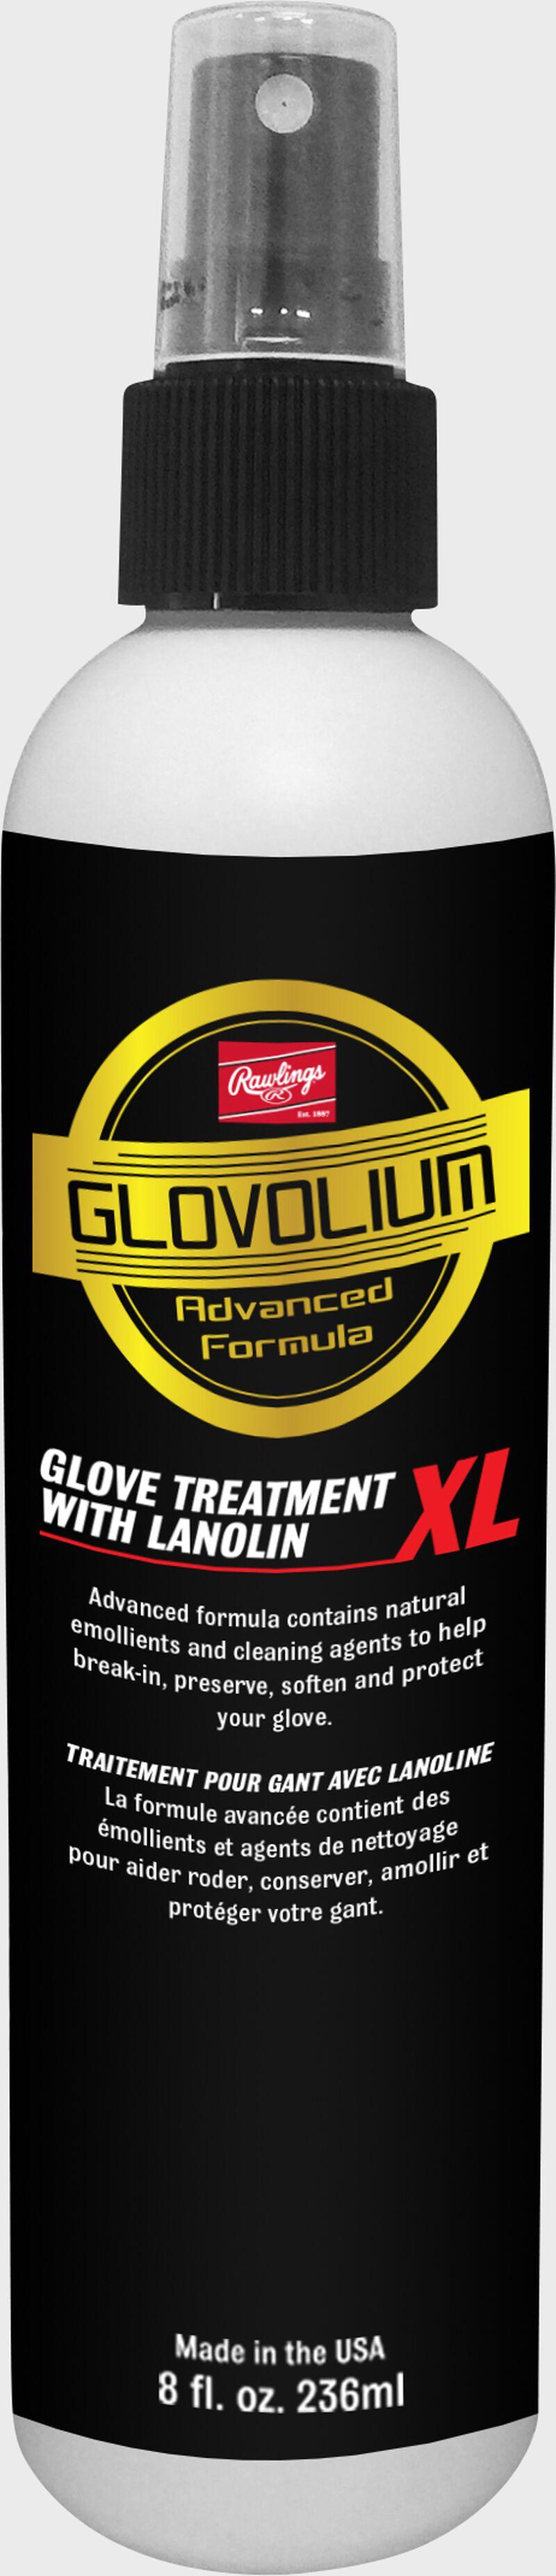 A black G25XL Glovolium XL glove treatment spray bottle SKU #G25XL